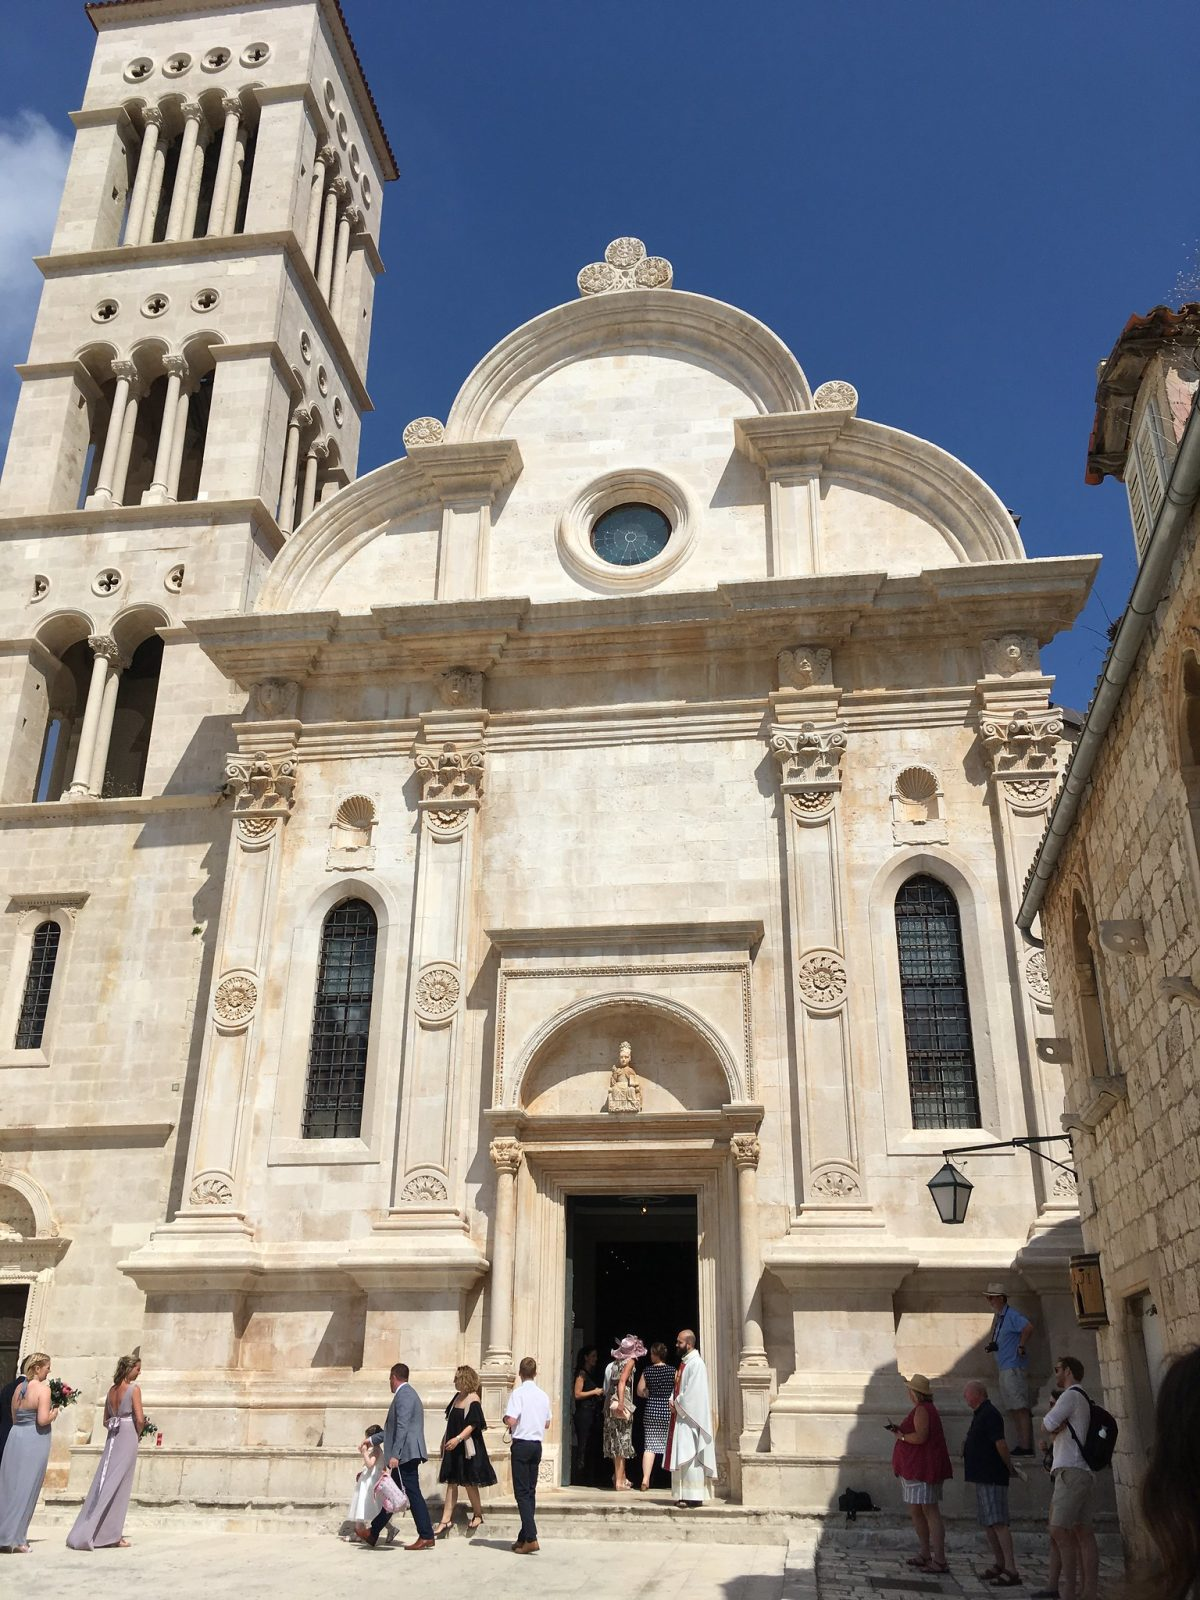 St. Stephen's Cathedral, Hvar, Croatia